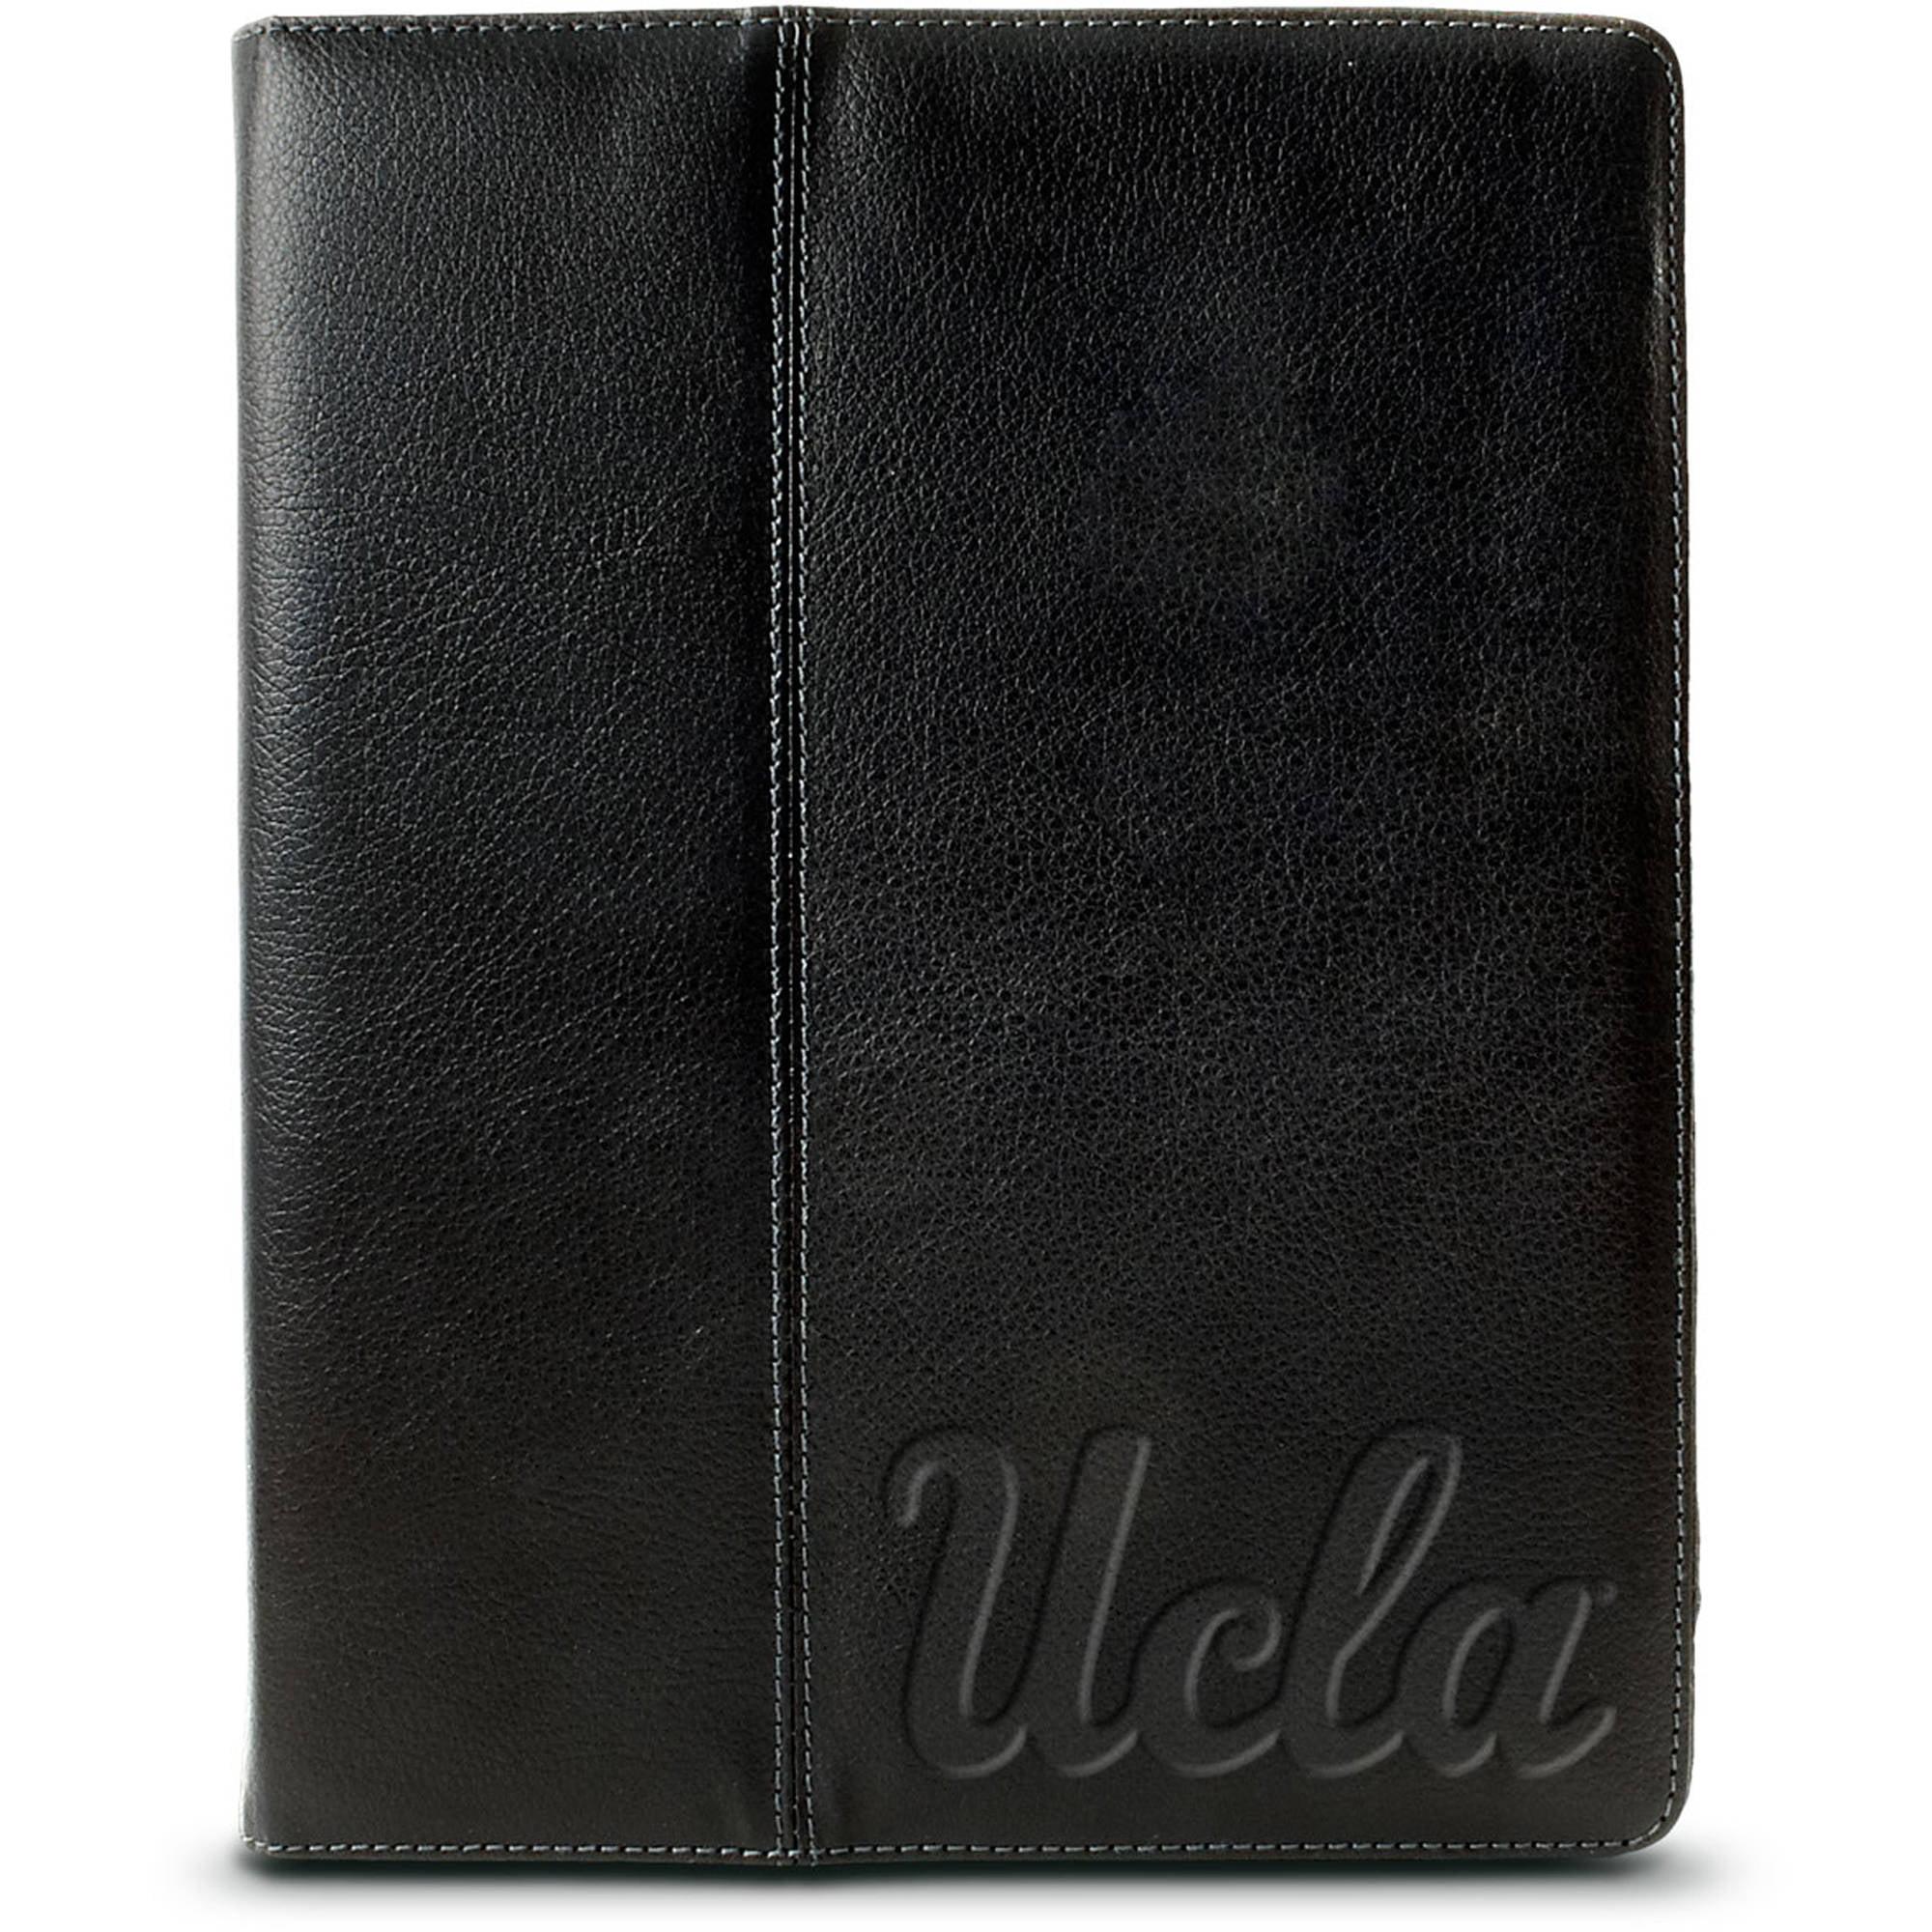 Centon iPad Leather Folio Case UCLA